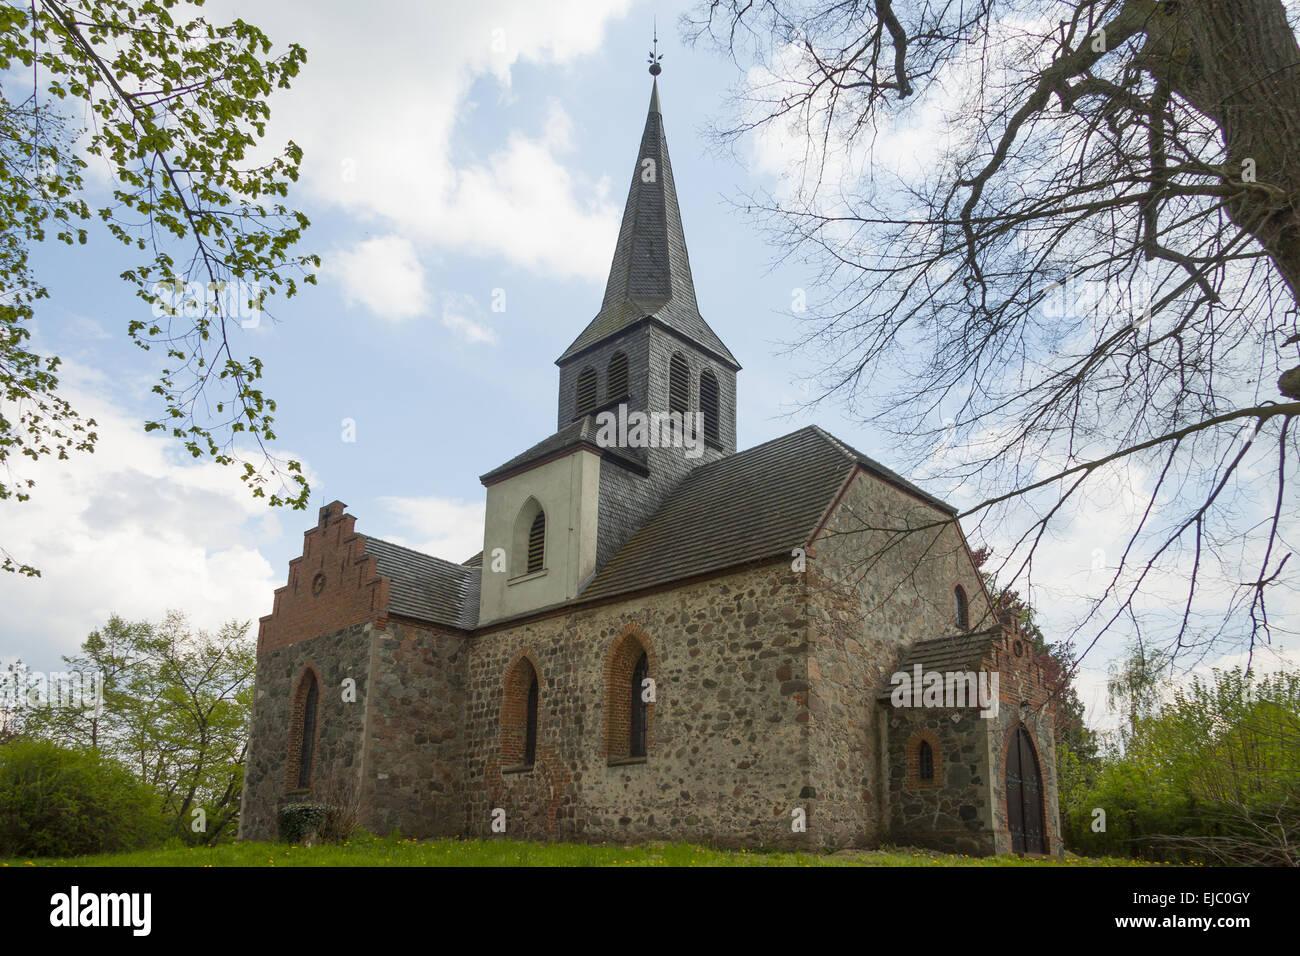 Village church Sauen - Stock Image